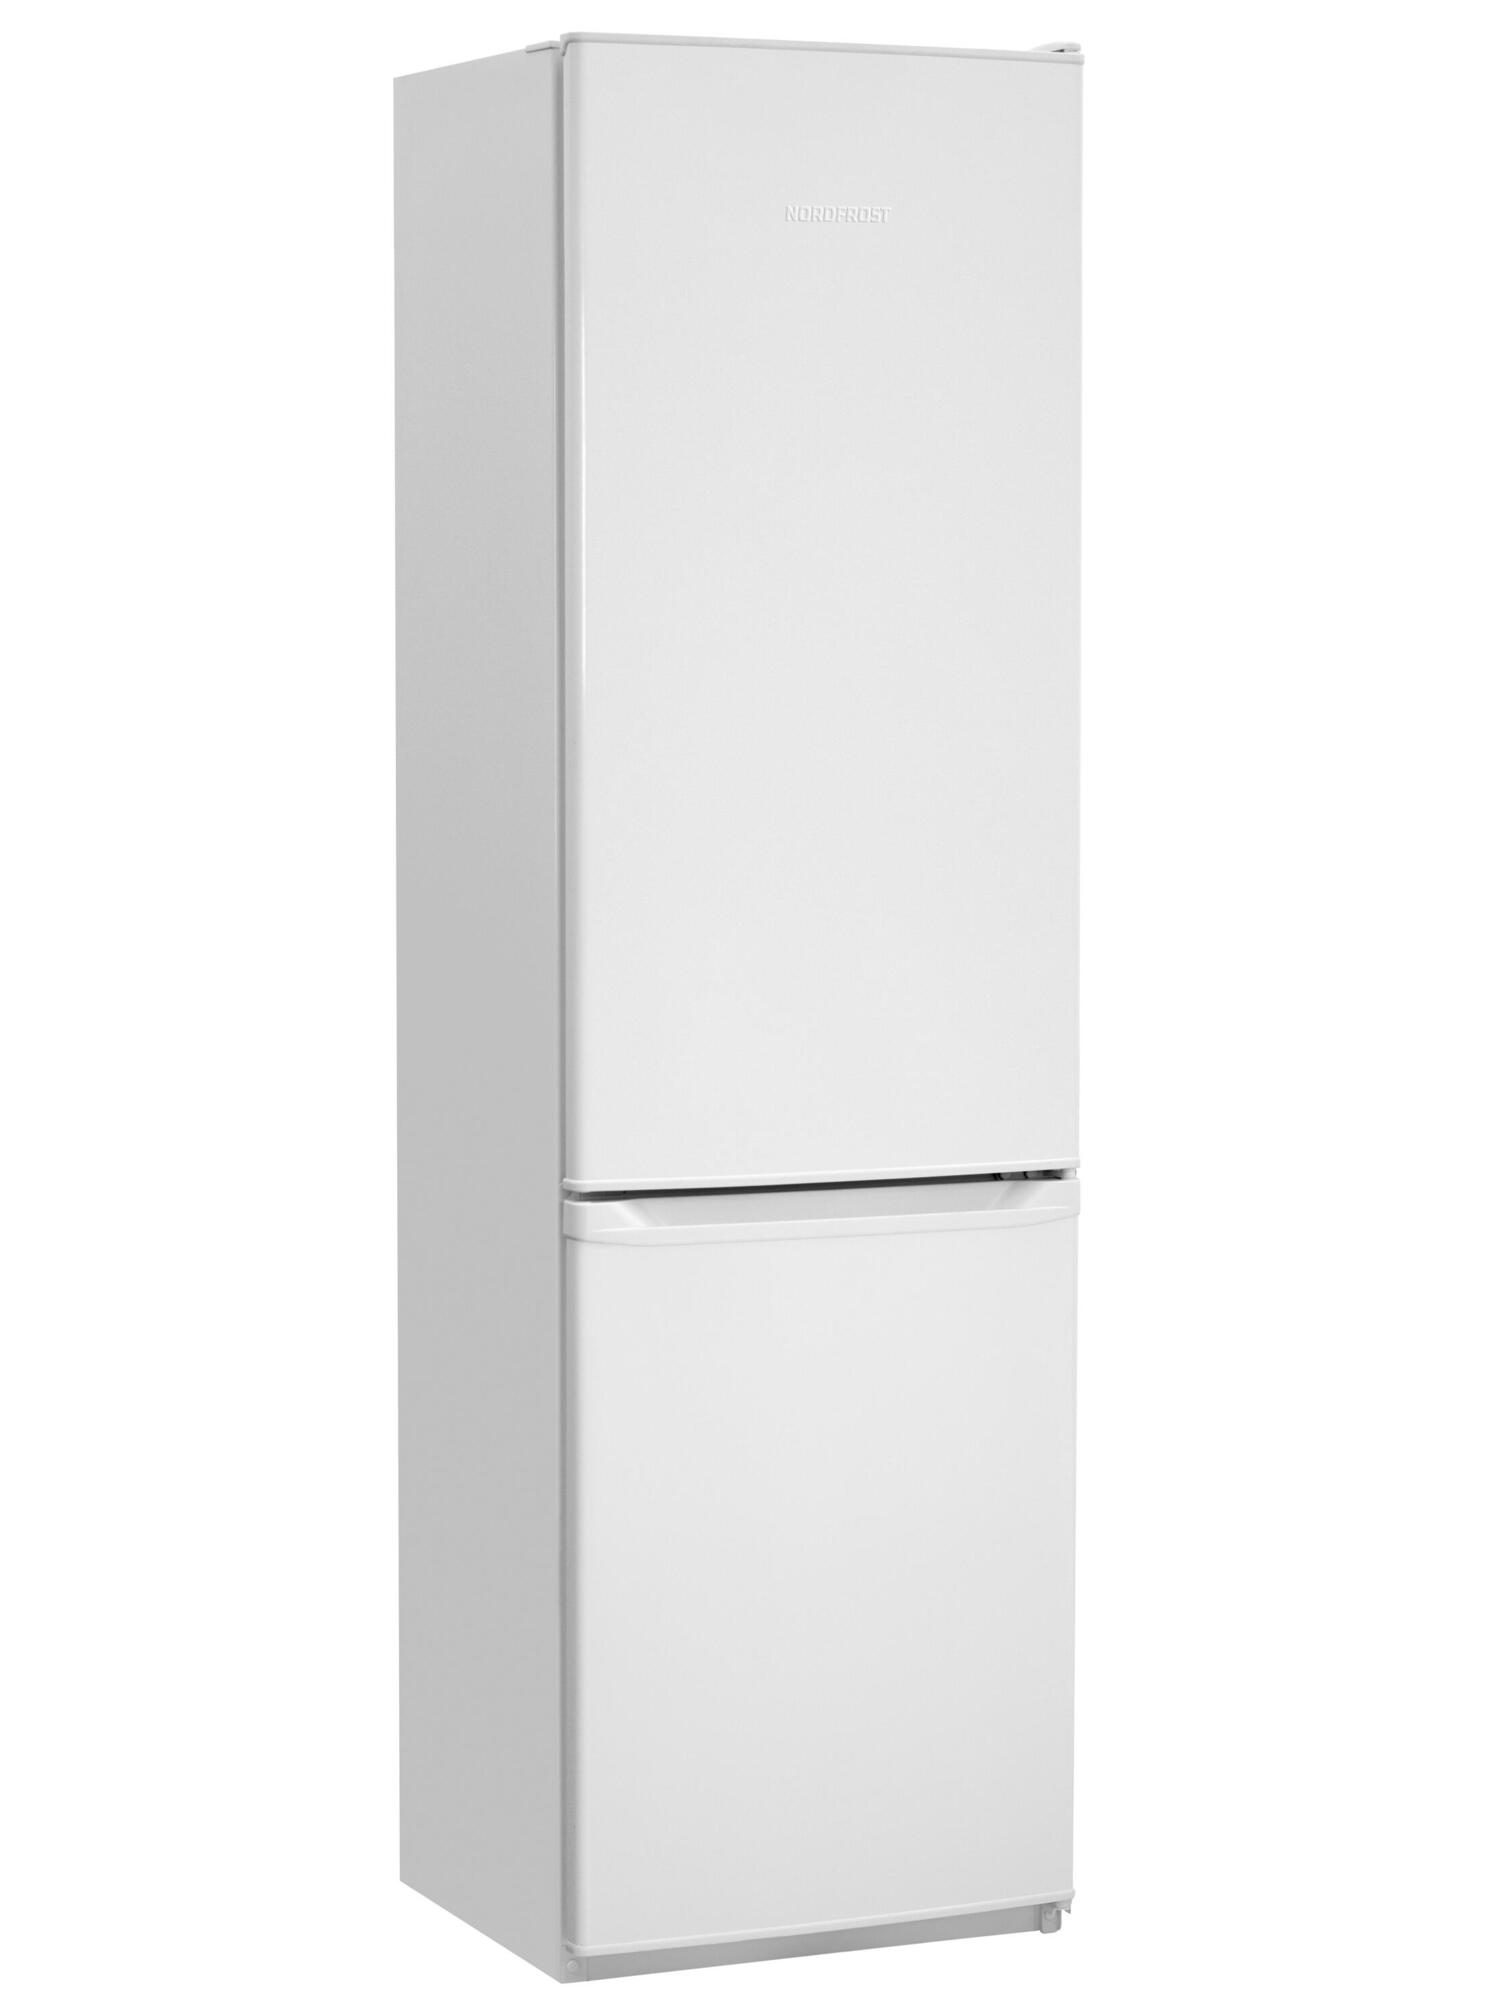 Холодильник NORDFROST NRB 154NF-032